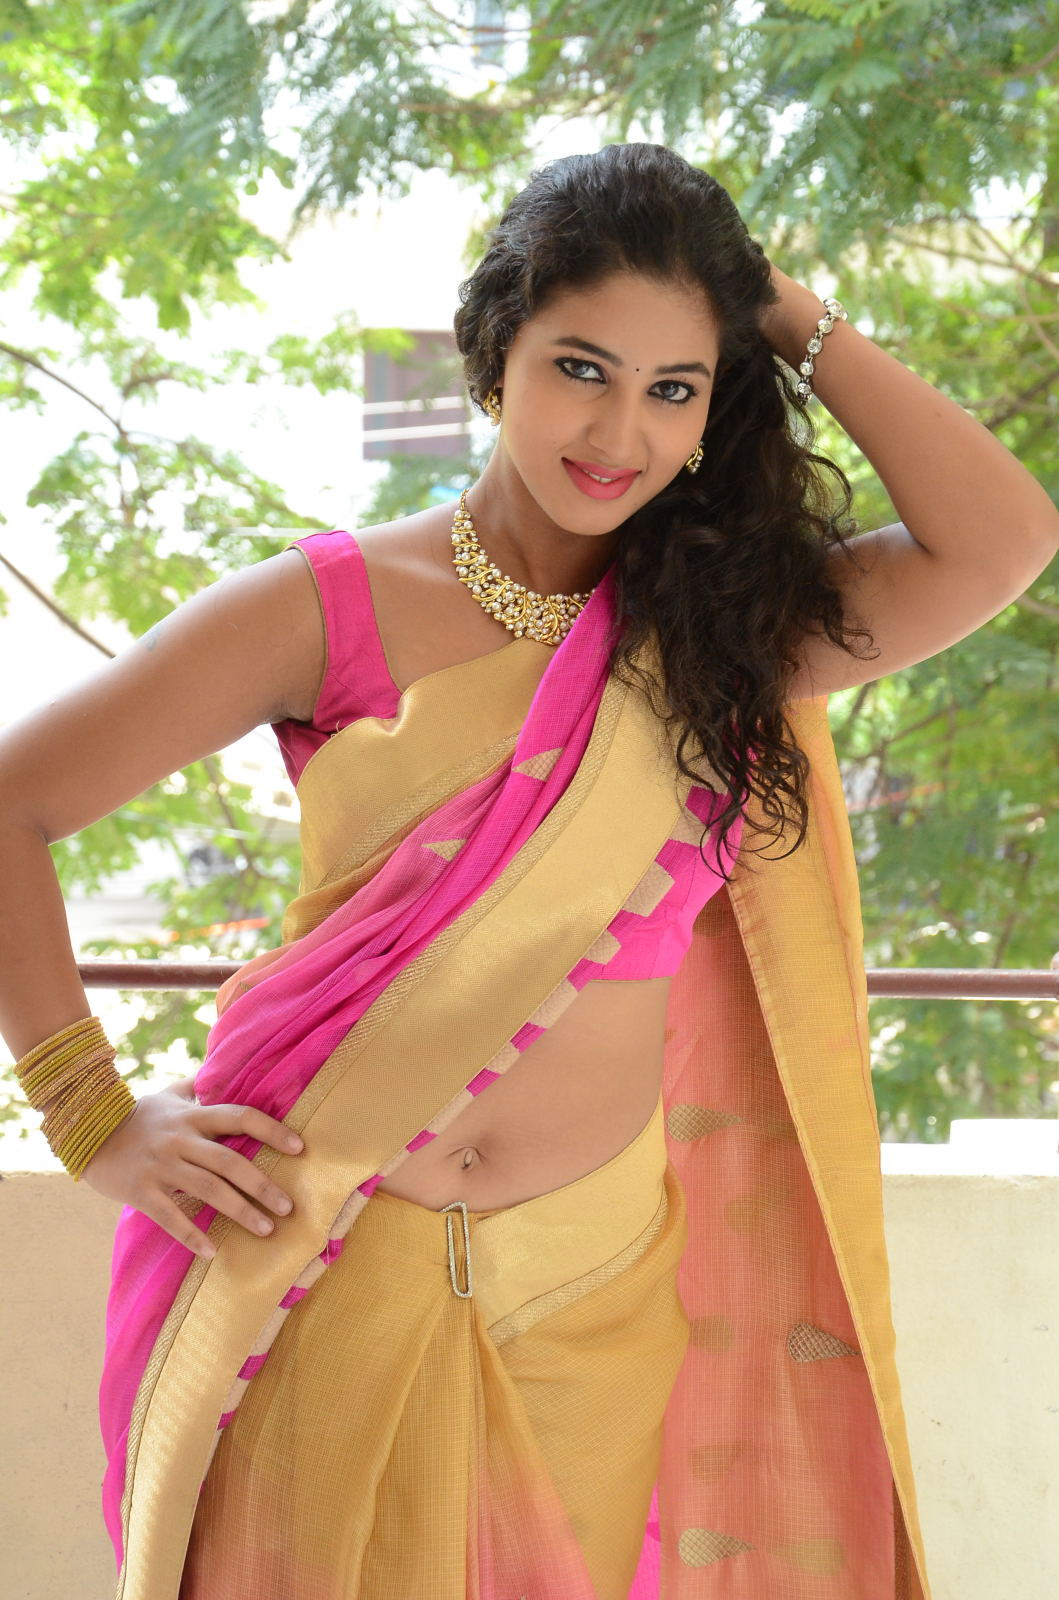 pavani new photos in saree-HQ-Photo-13